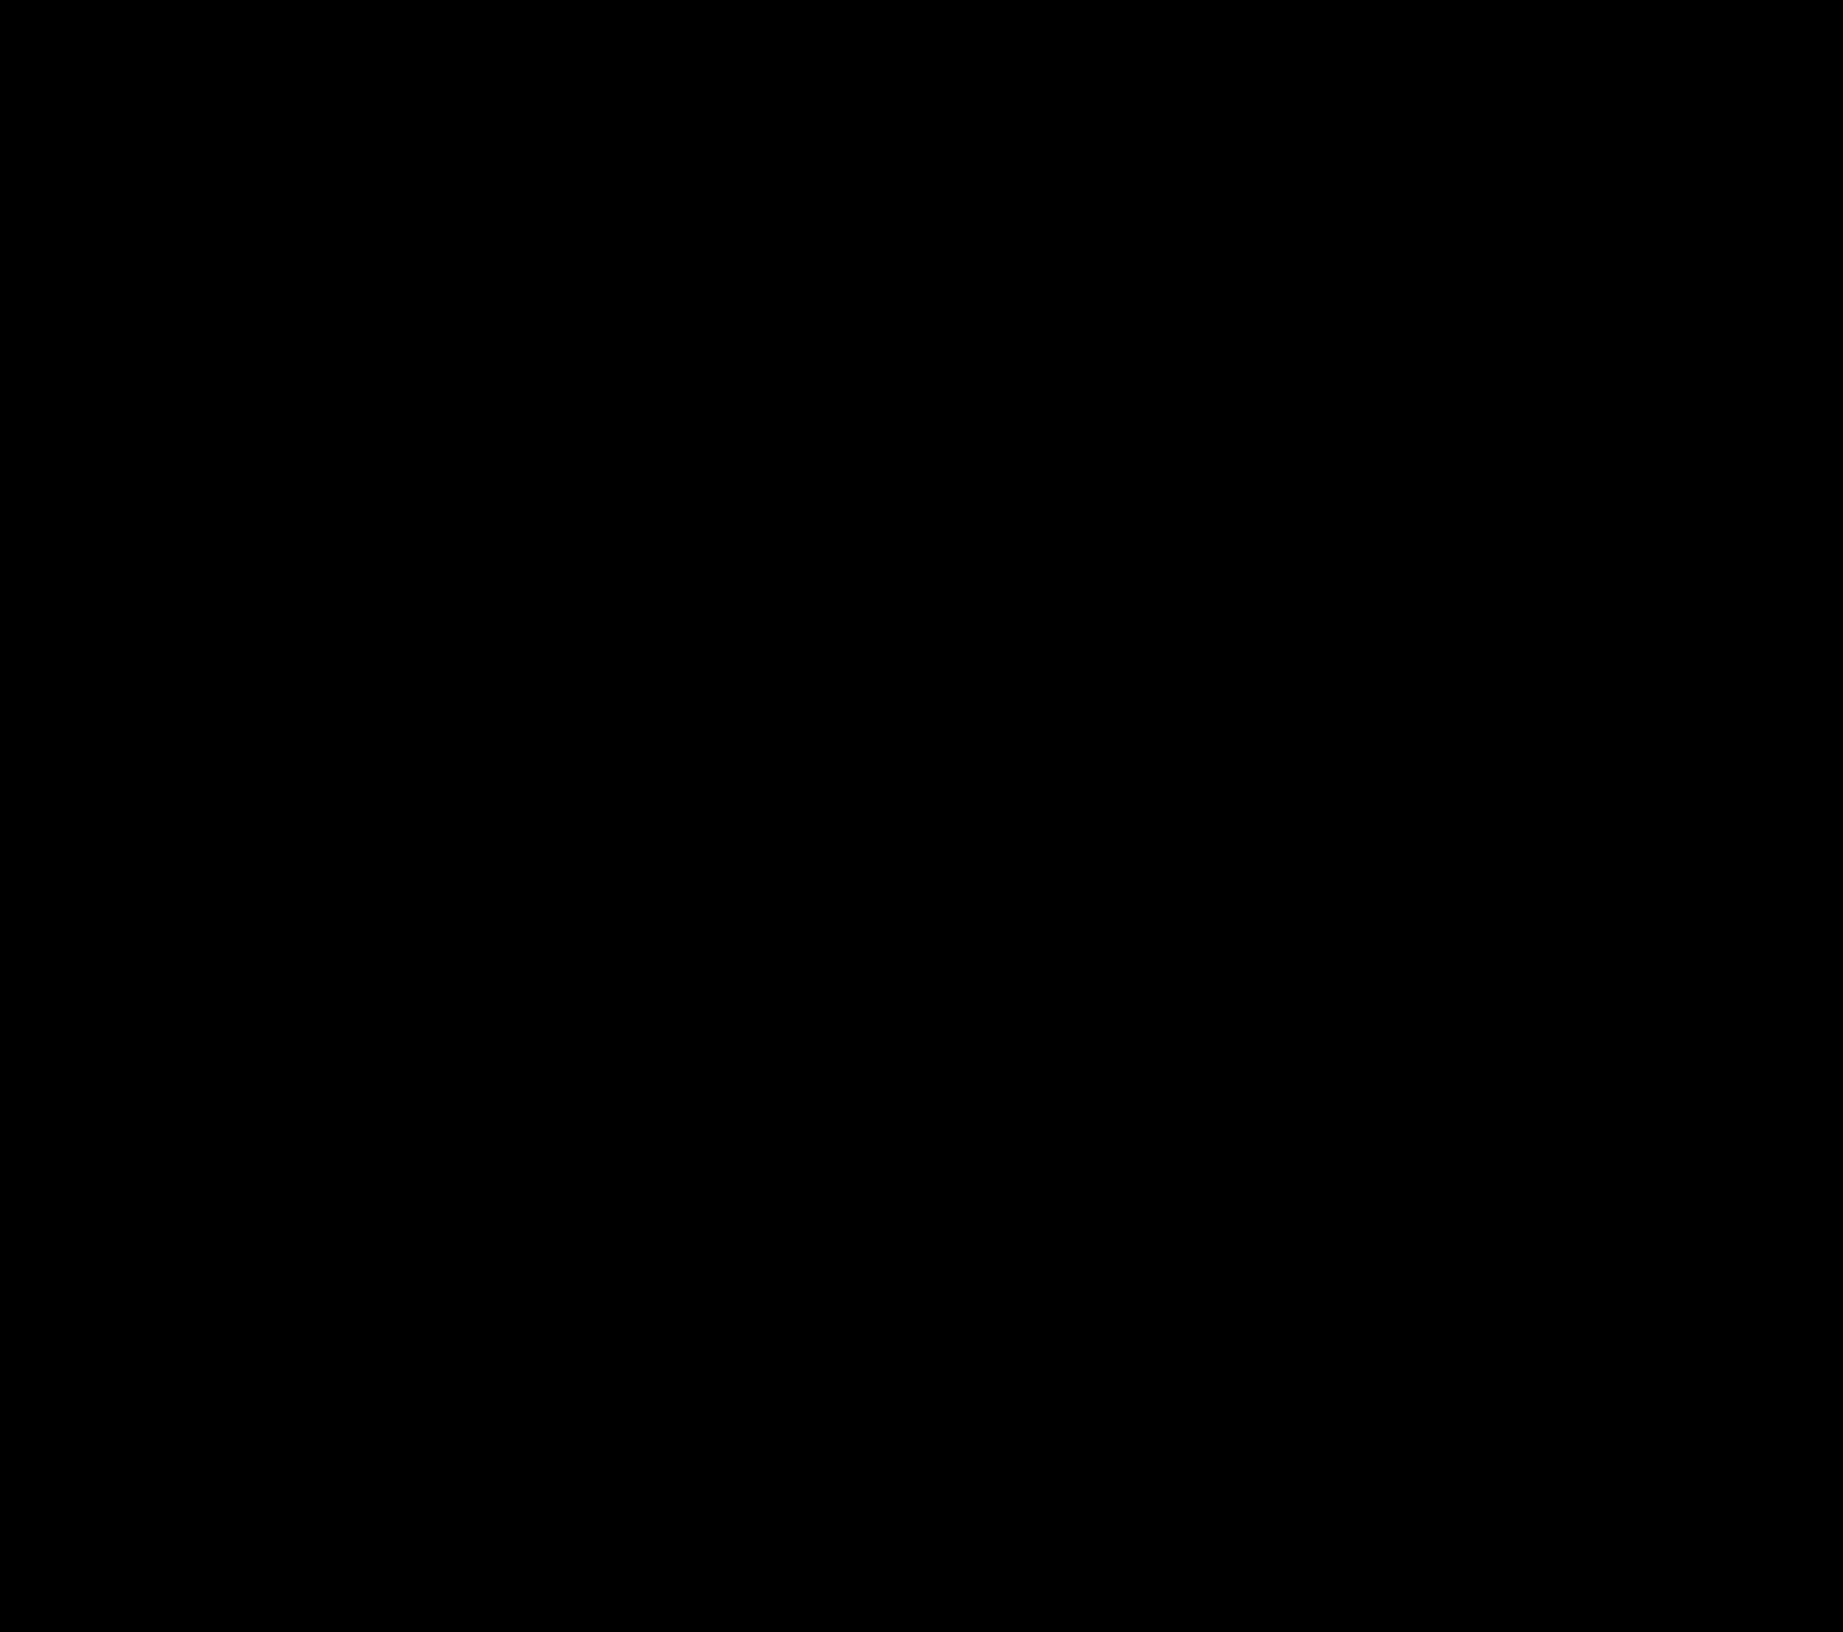 beagle silhouette clip art at getdrawings com free for personal rh getdrawings com bagel clip art free bagel clip art free